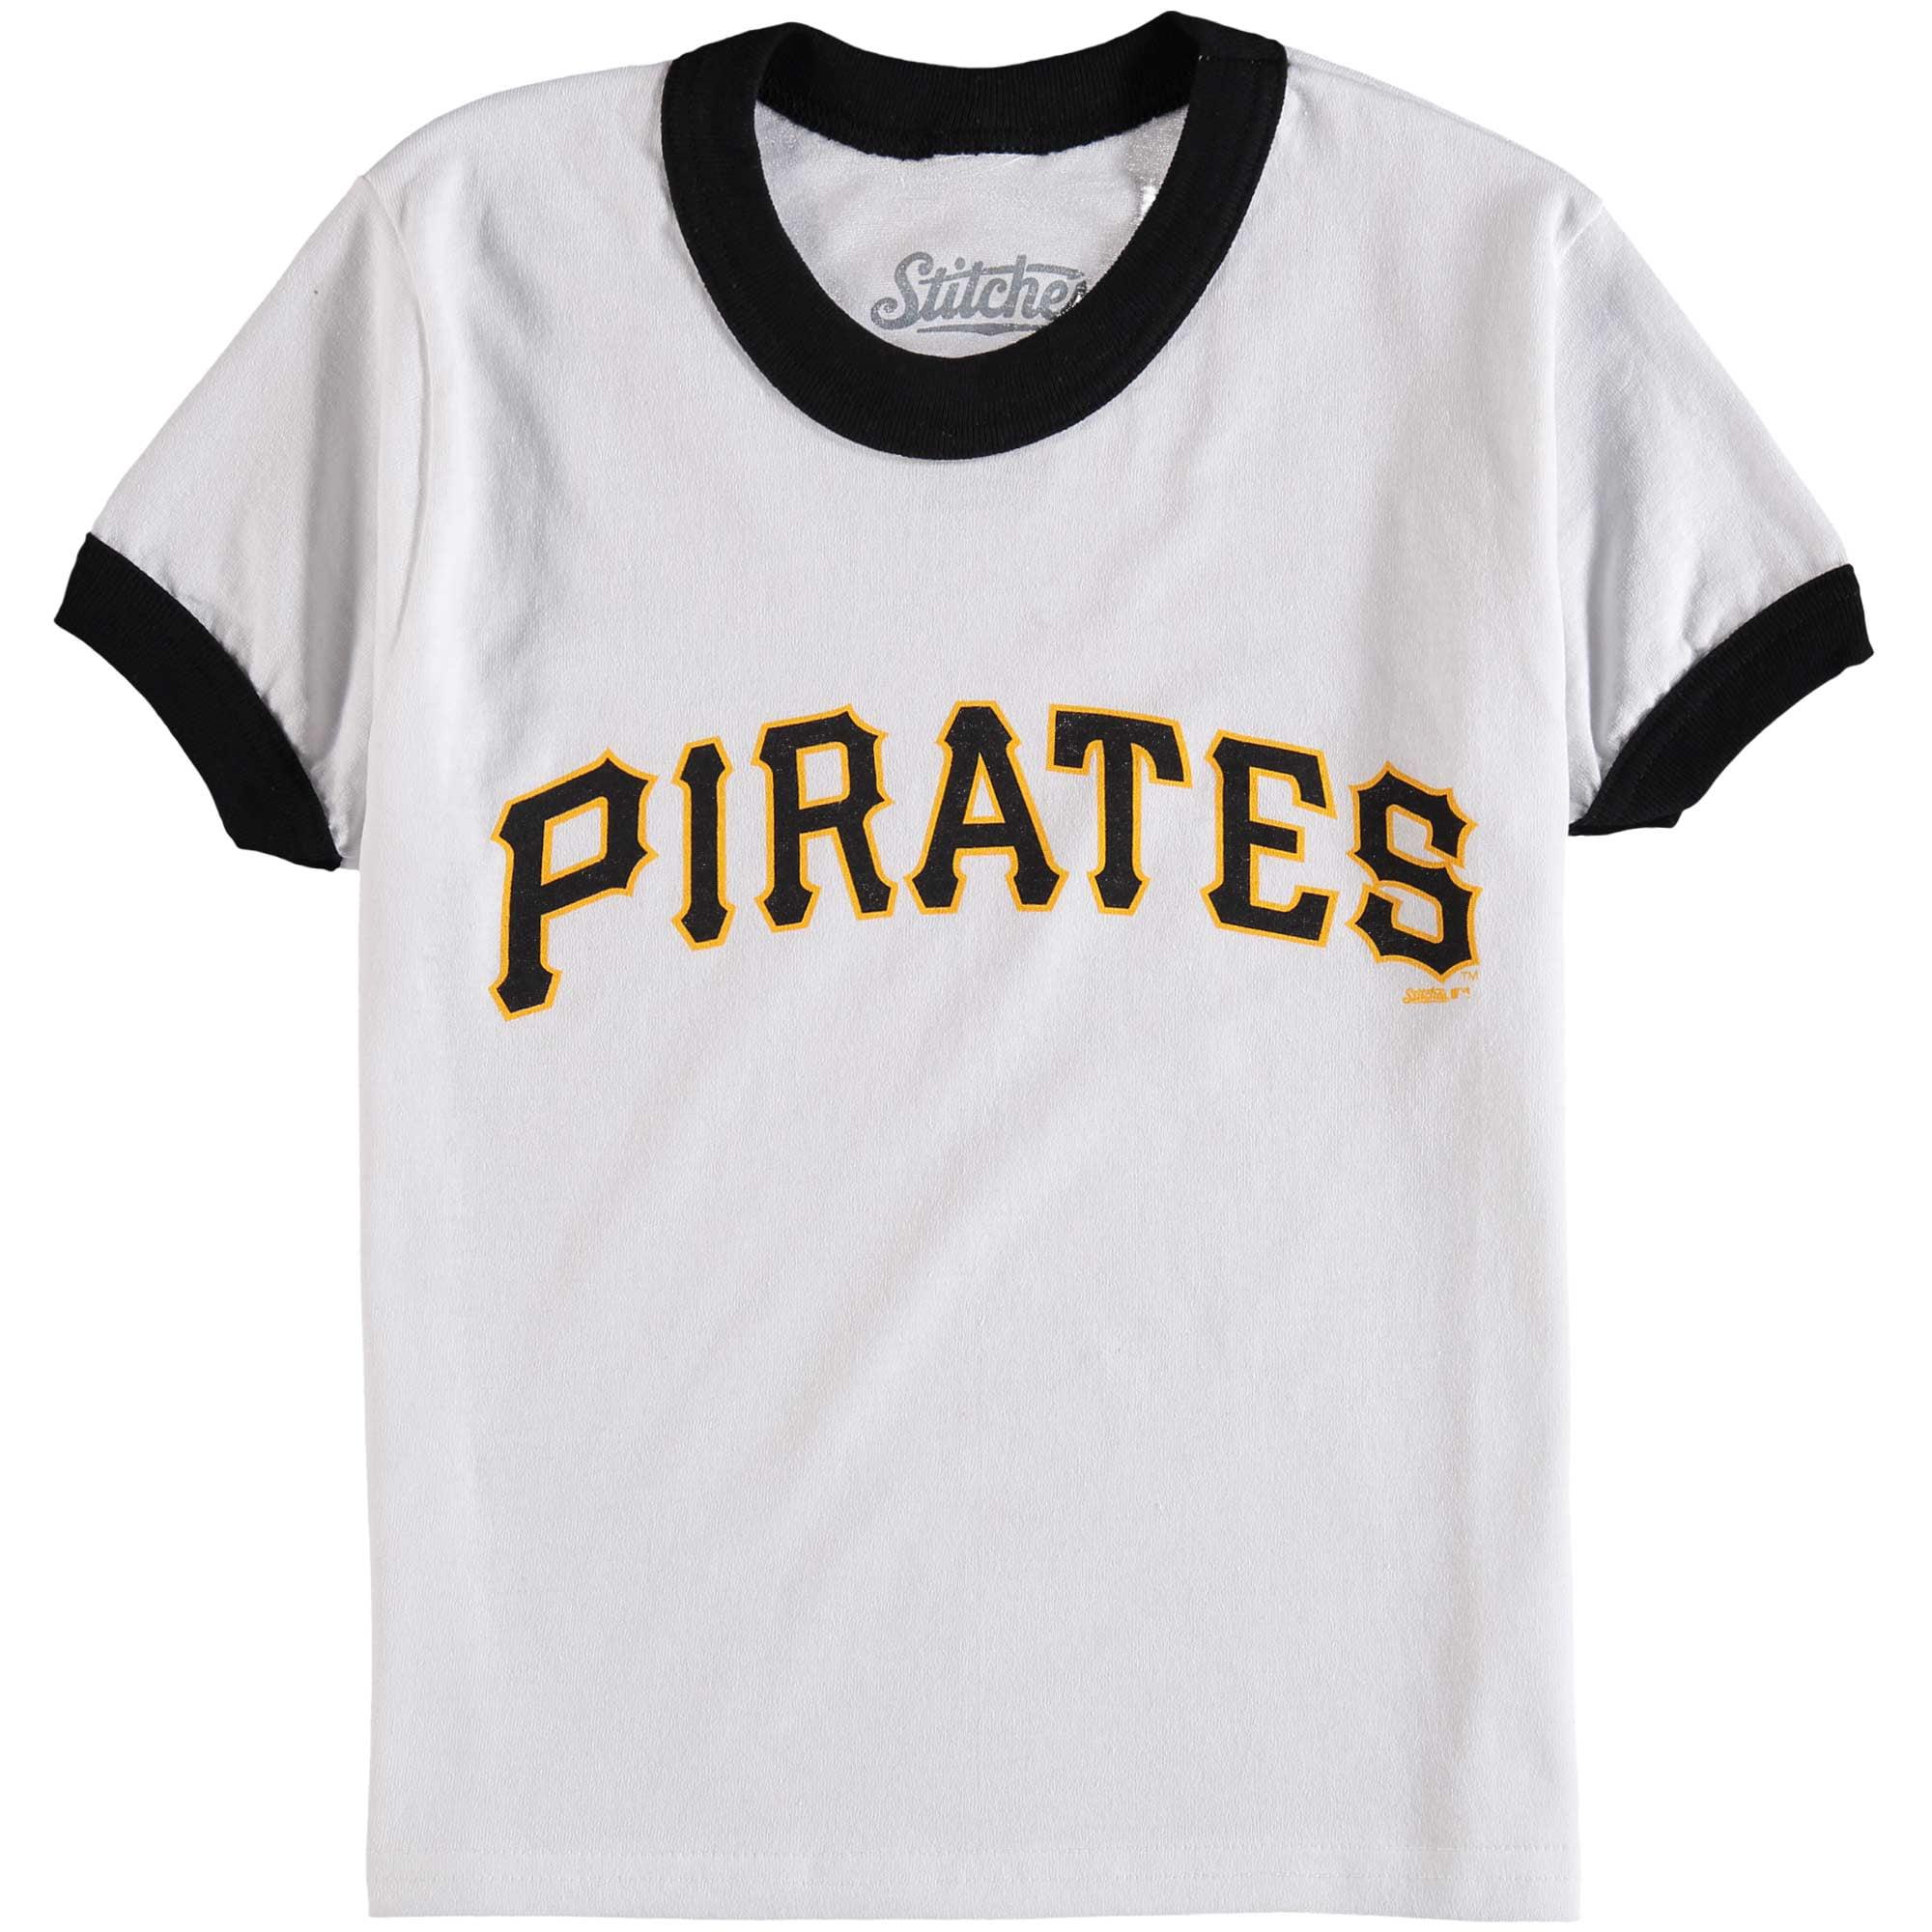 Pittsburgh Pirates Stitches Youth Ringer T-Shirt - White/Black